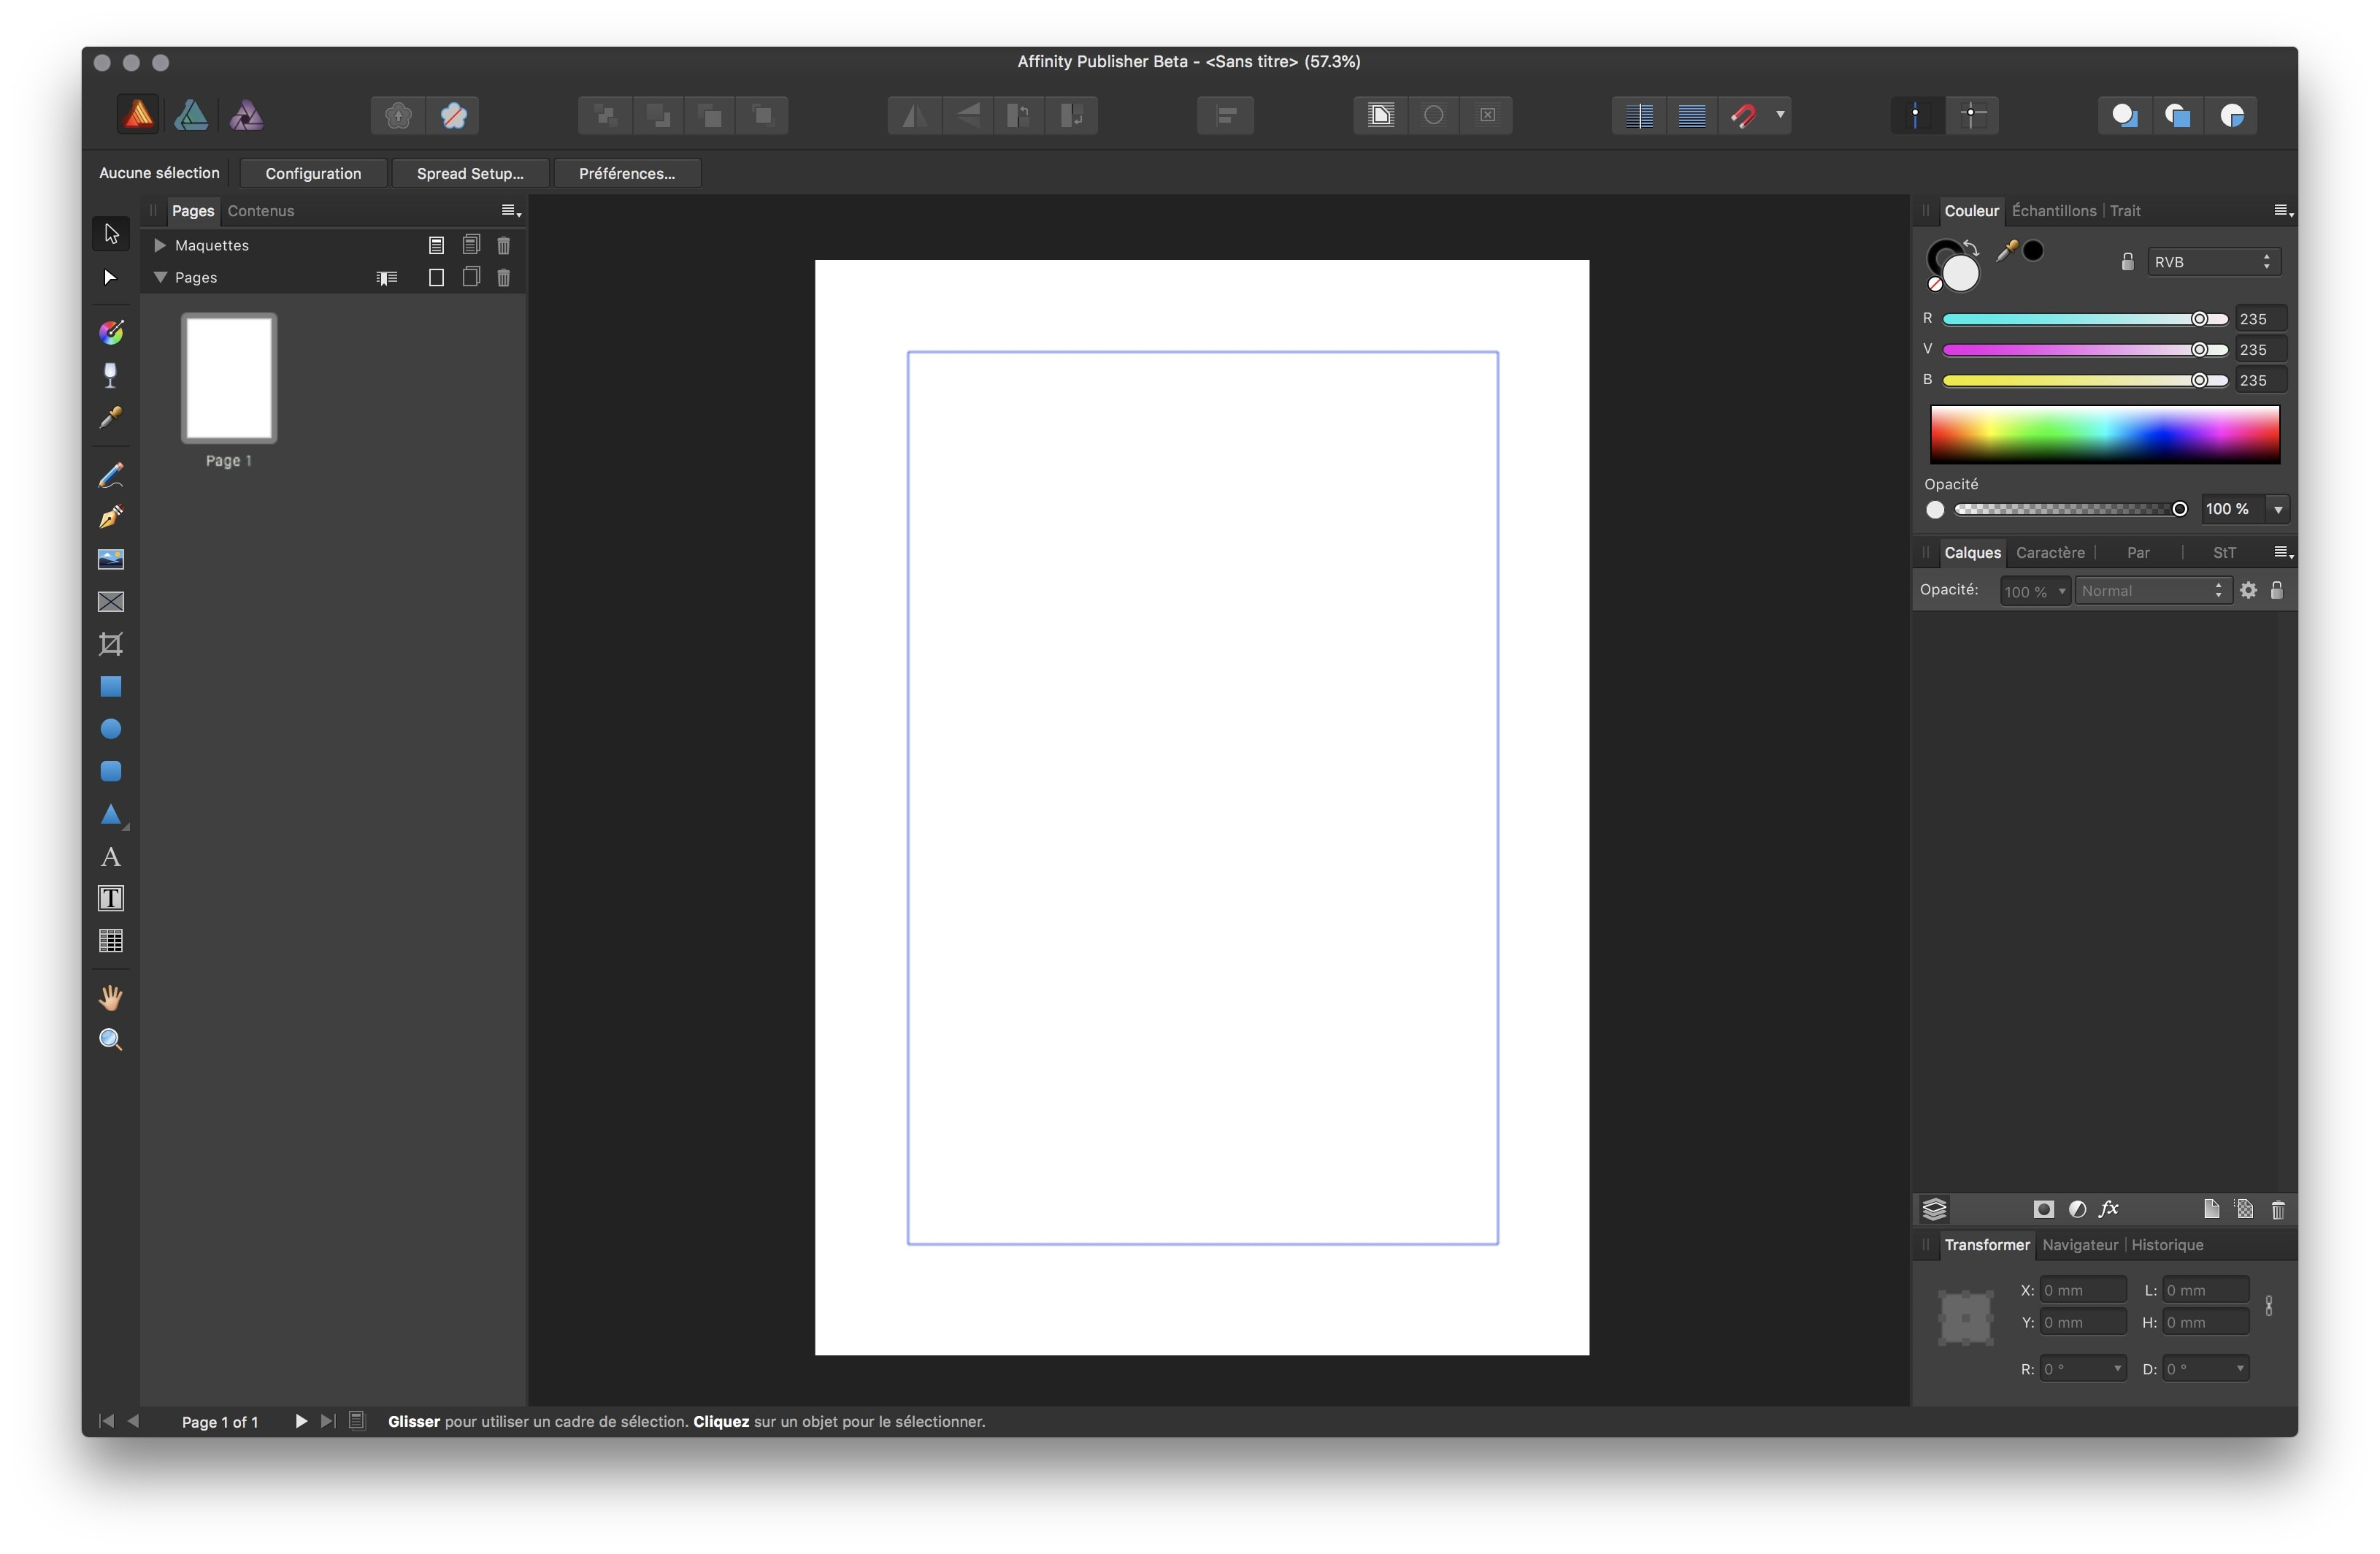 Screenshot do Affinity Publisher beta